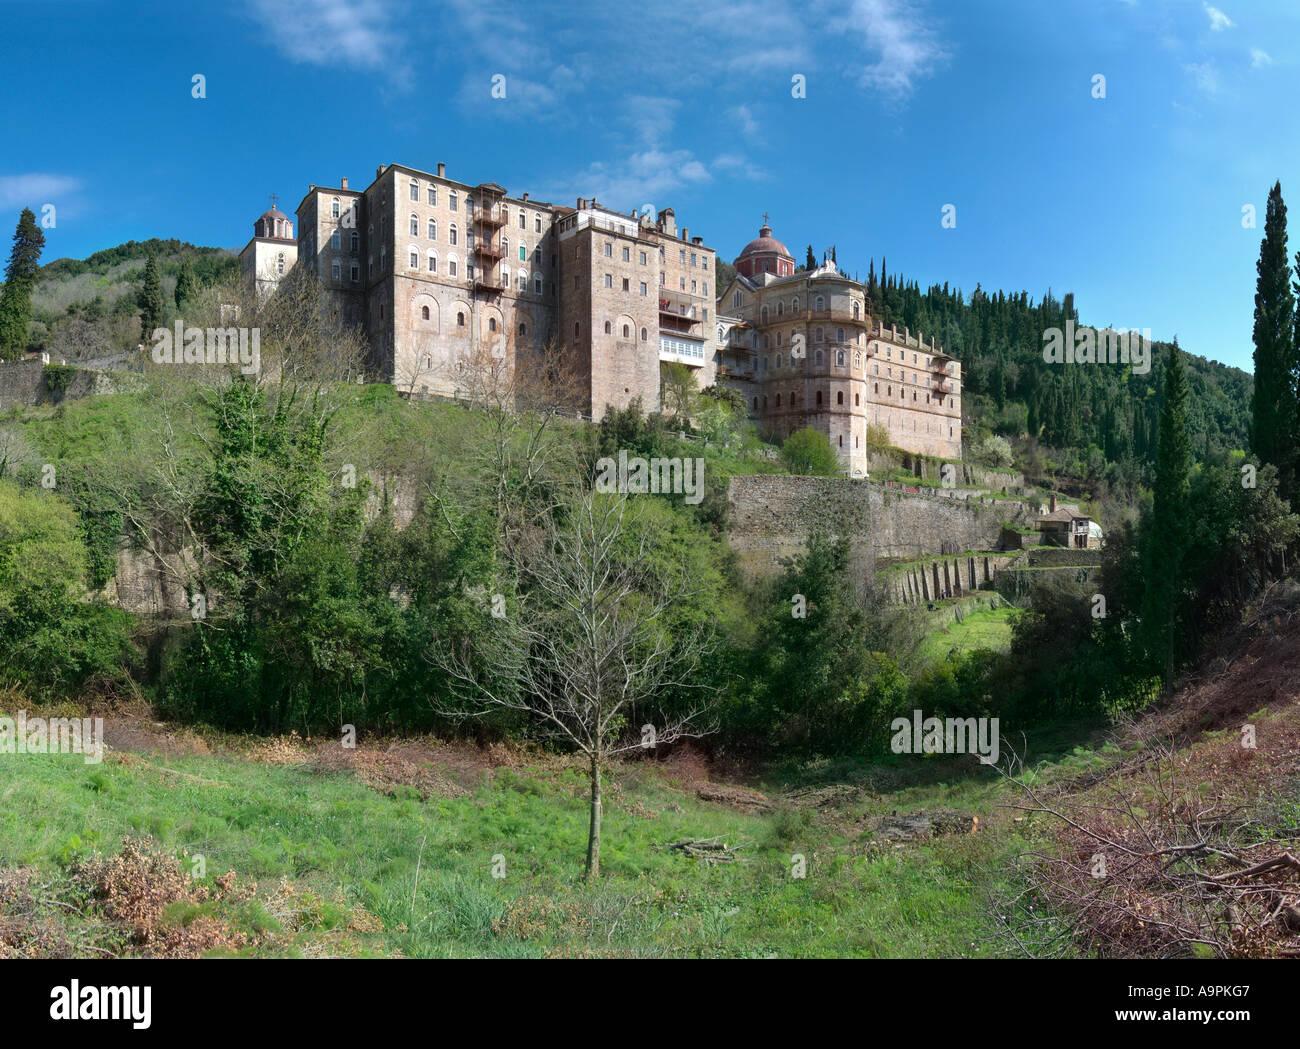 Zografos mount athos Greece Greek orthodox Christian Monastery church retreat holy protected remote isolated 9th rank EU Europe - Stock Image